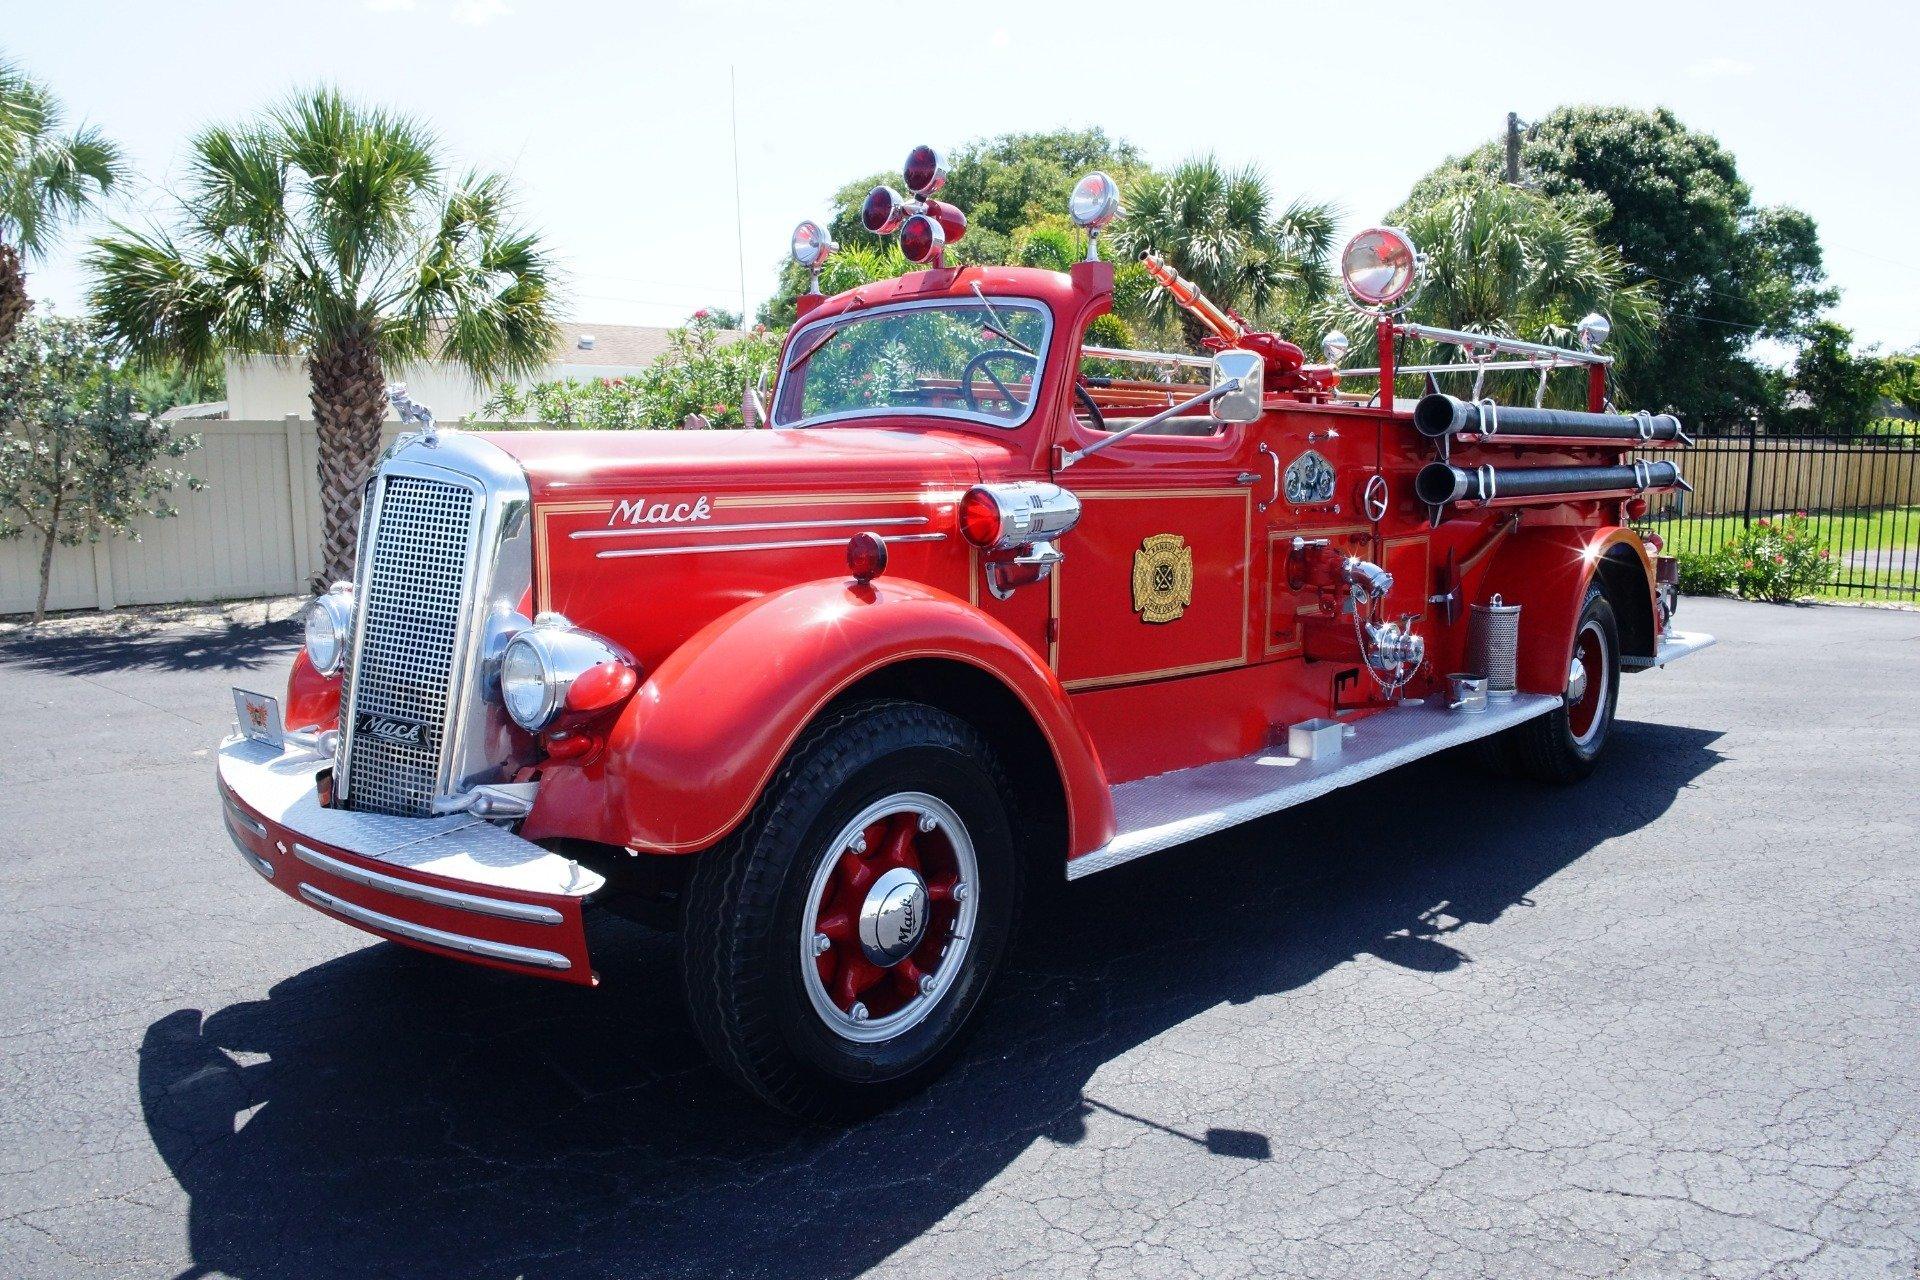 1943 Mack Model 505 Fire Truck | Ideal Classic Cars LLC